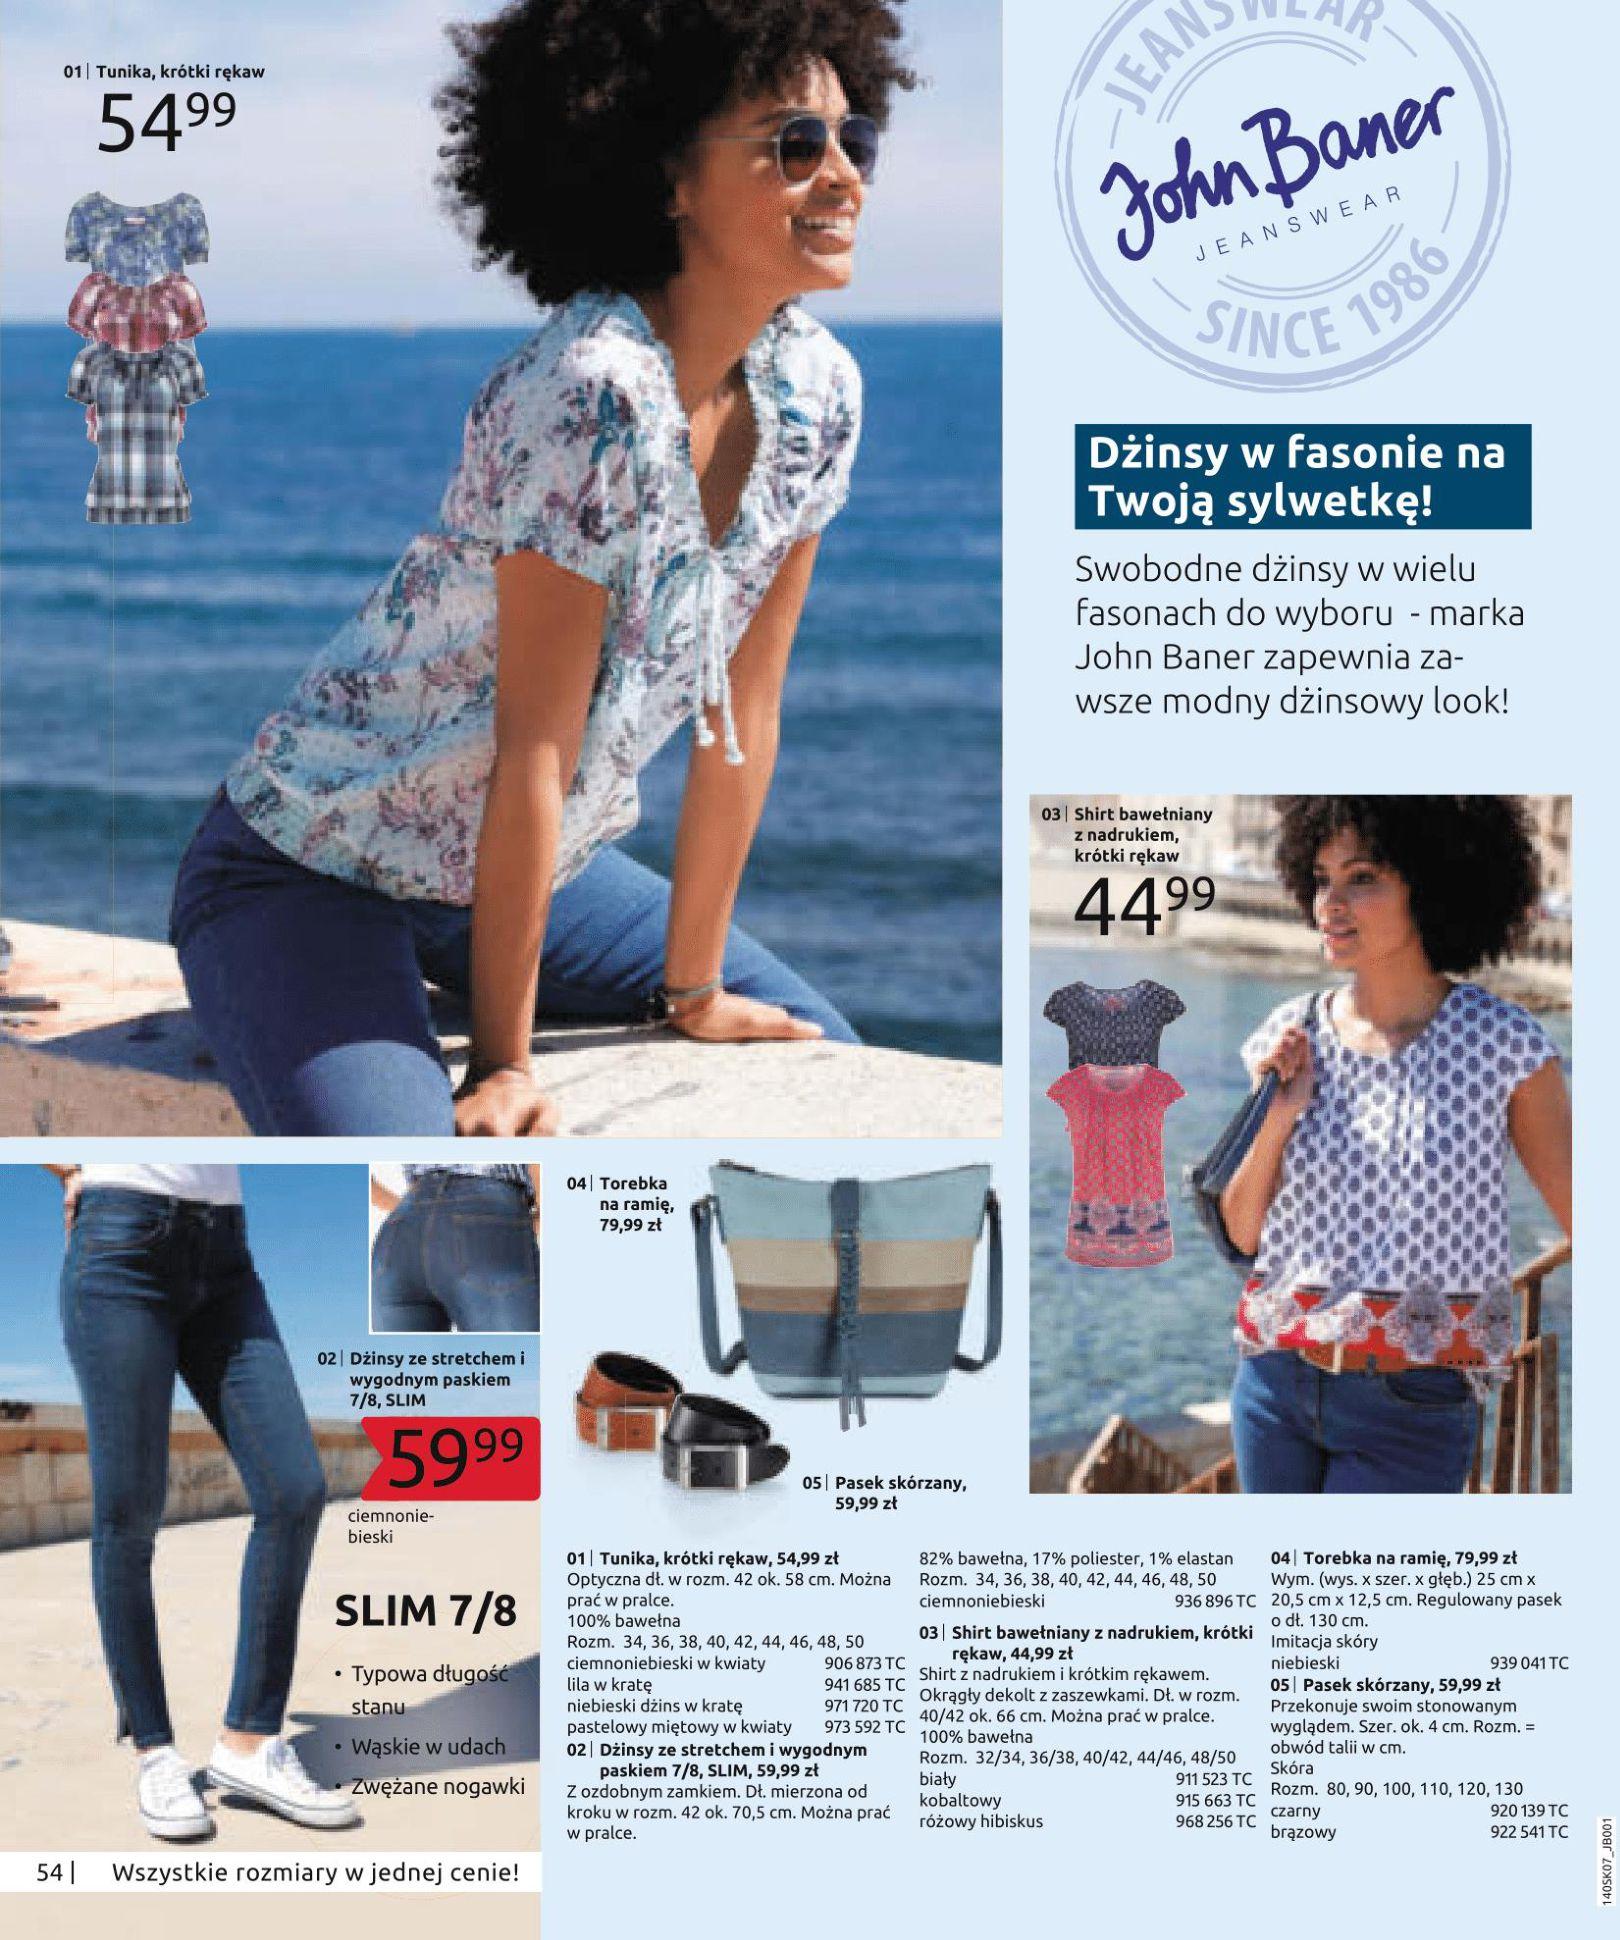 Gazetka Bonprix - Letnie trendy-02.07.2019-15.01.2020-page-56